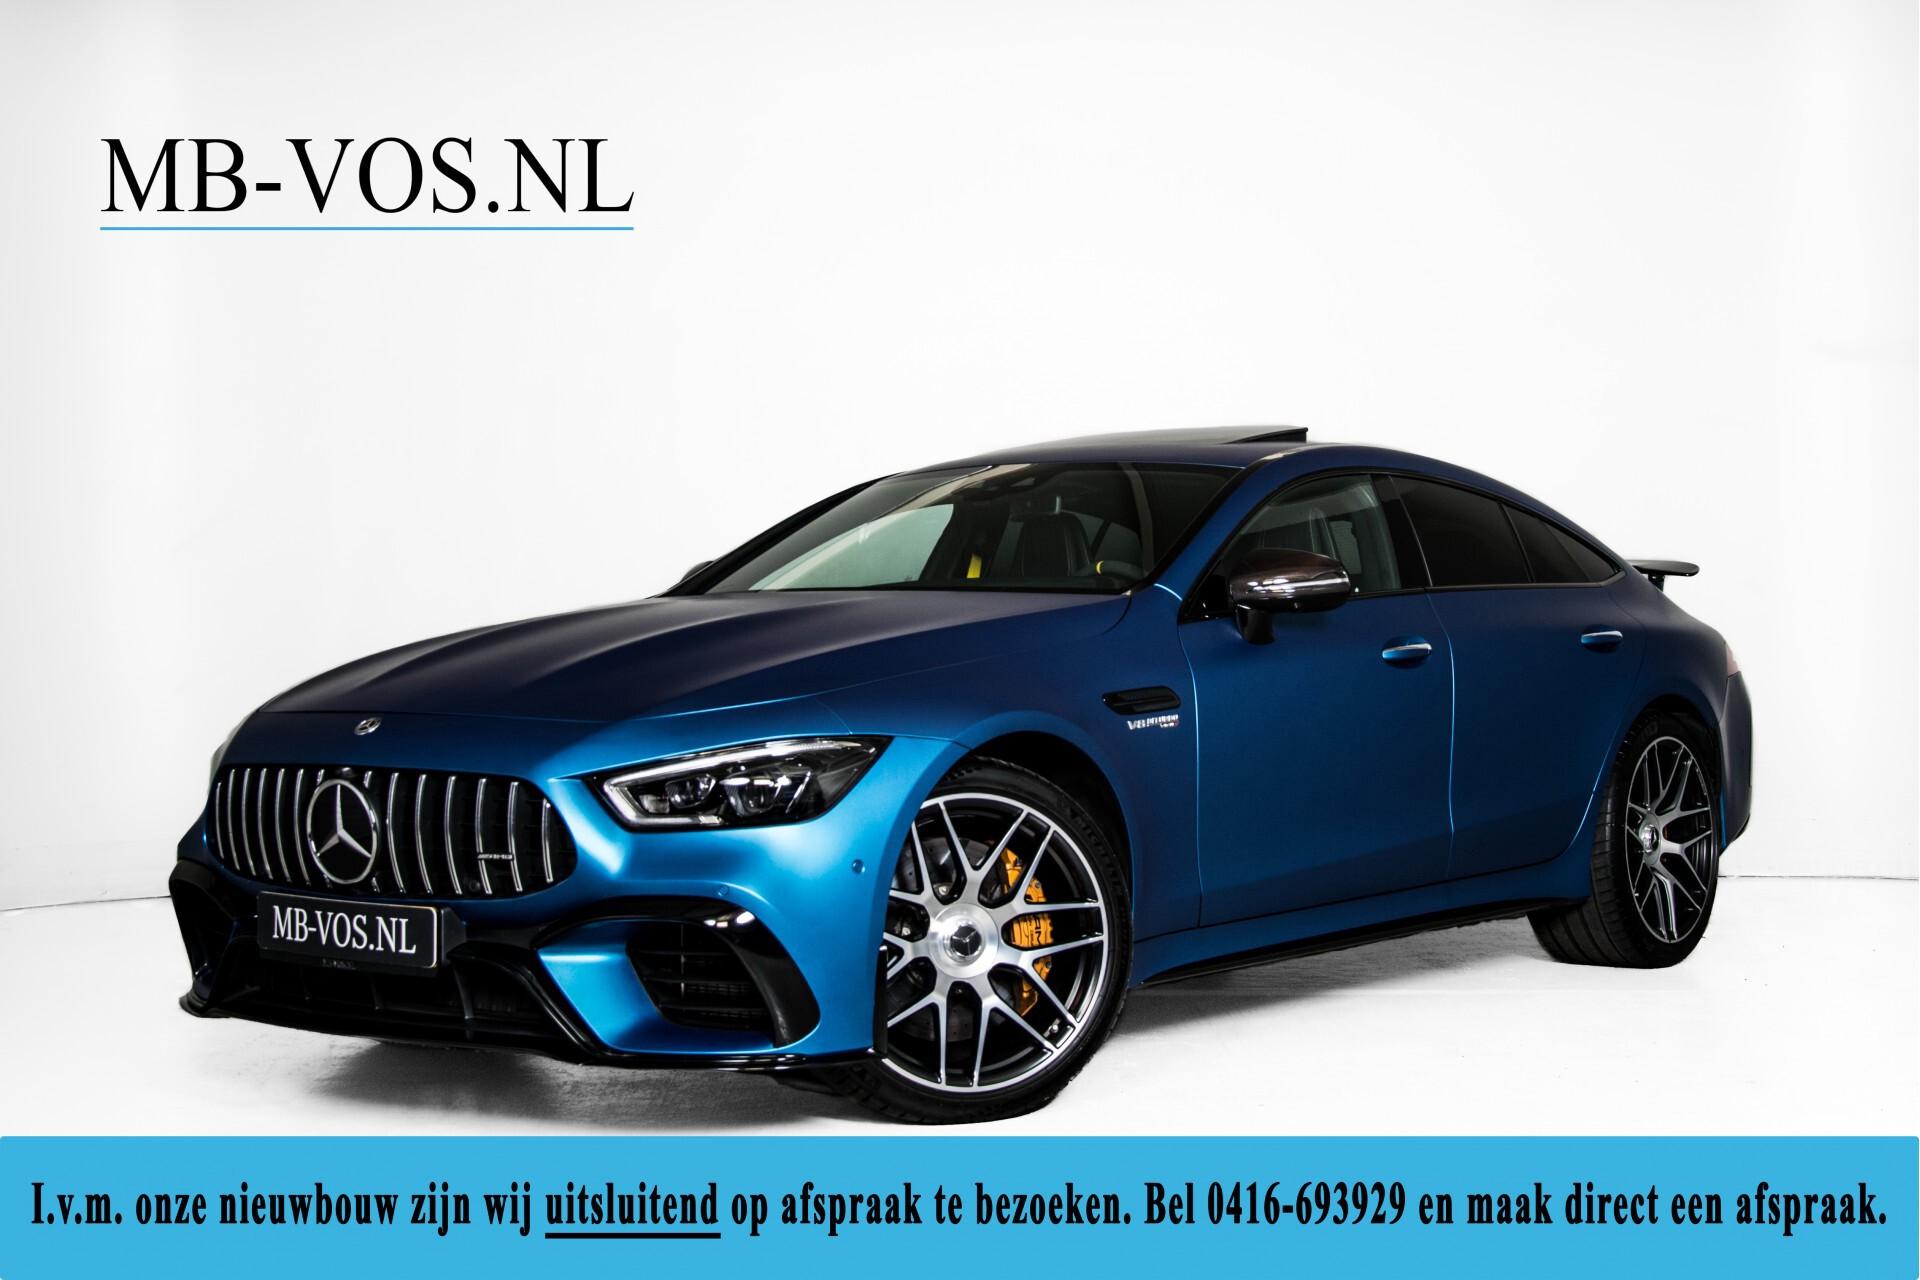 Mercedes-Benz AMG GT 4-Door Coupe 63 S 4MATIC+ Edition 1 Keramisch/Carbon/First Class/Dynamic Plus/Burmester High End 3D Aut9 Foto 1